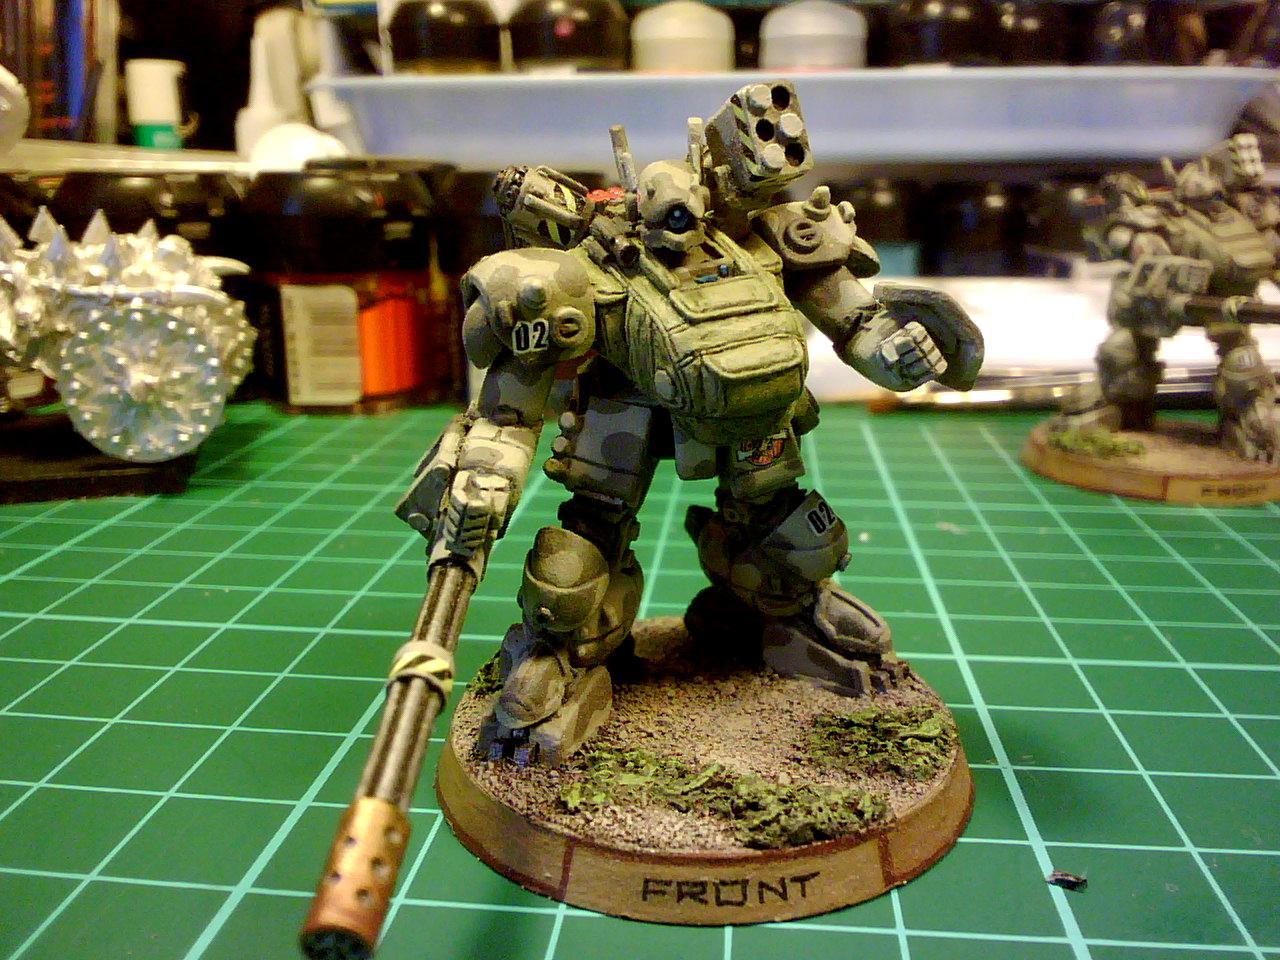 Armour Jacket, Camouflage, Cobra, Vhac